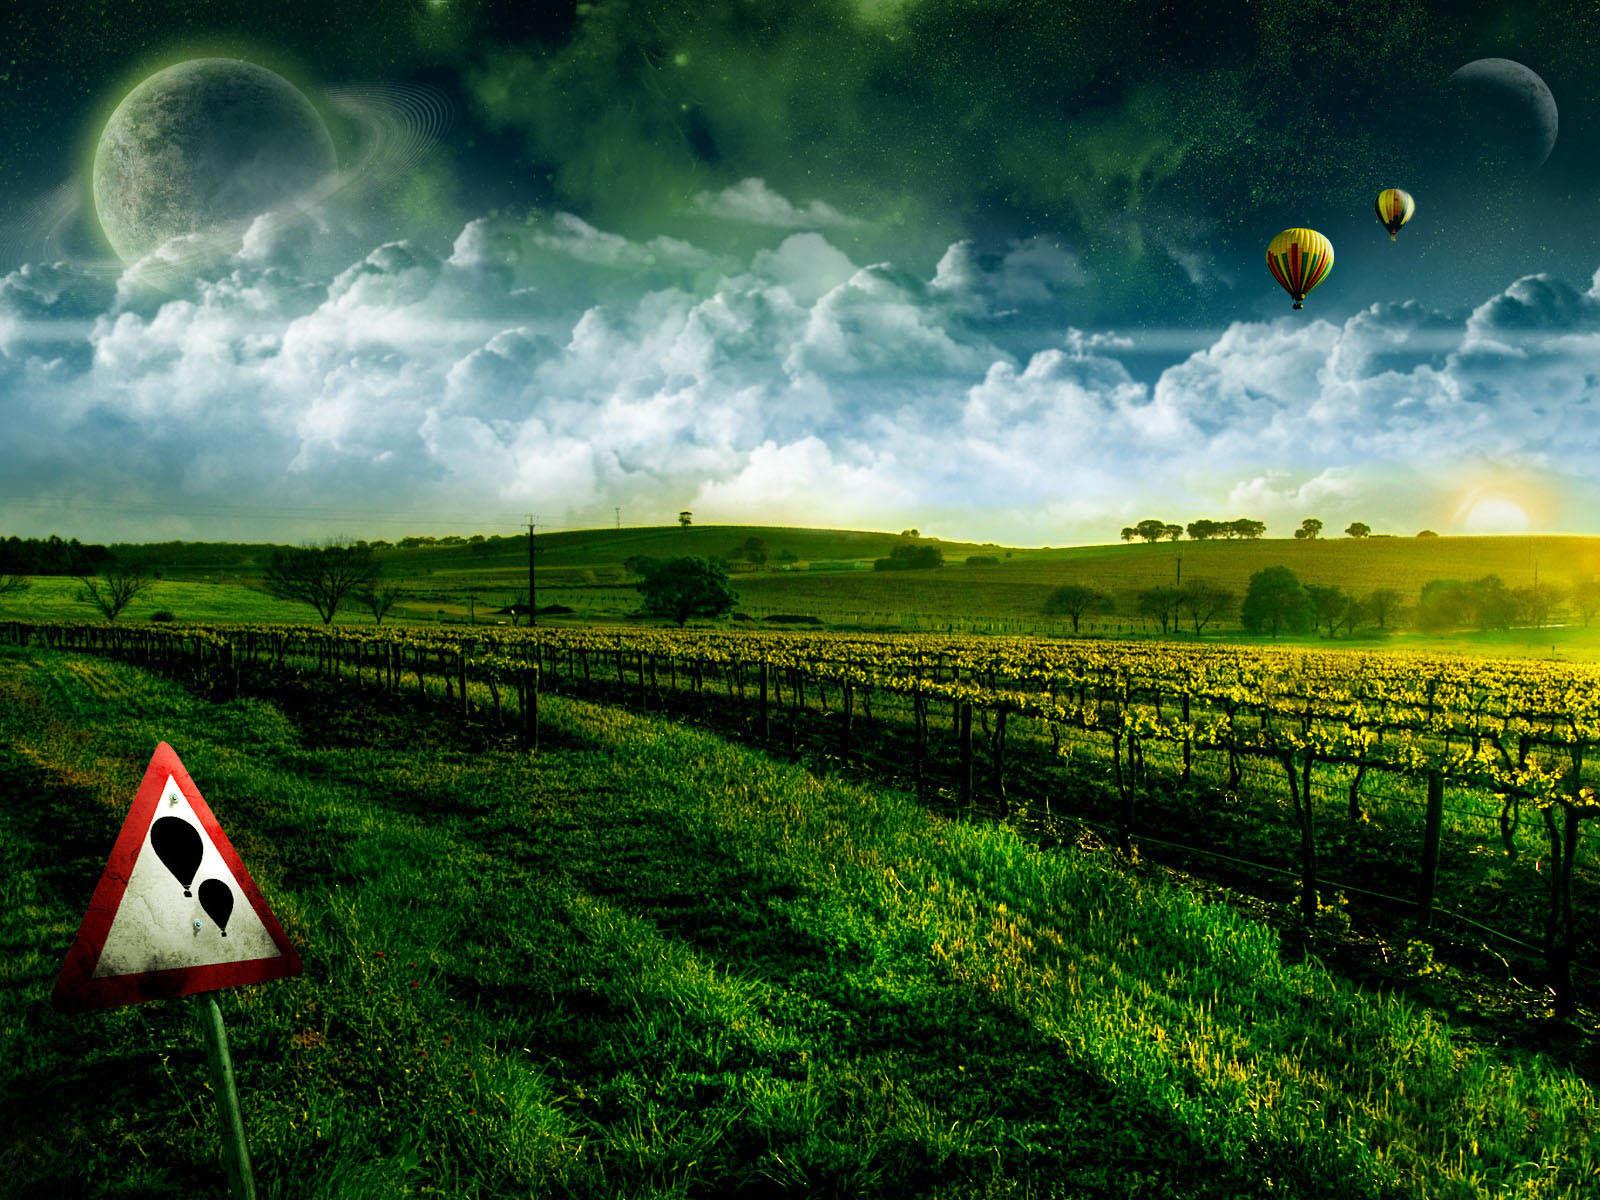 Desktop Backgrounds Wallpaper Desktop h787046 Landscape 1600x1200